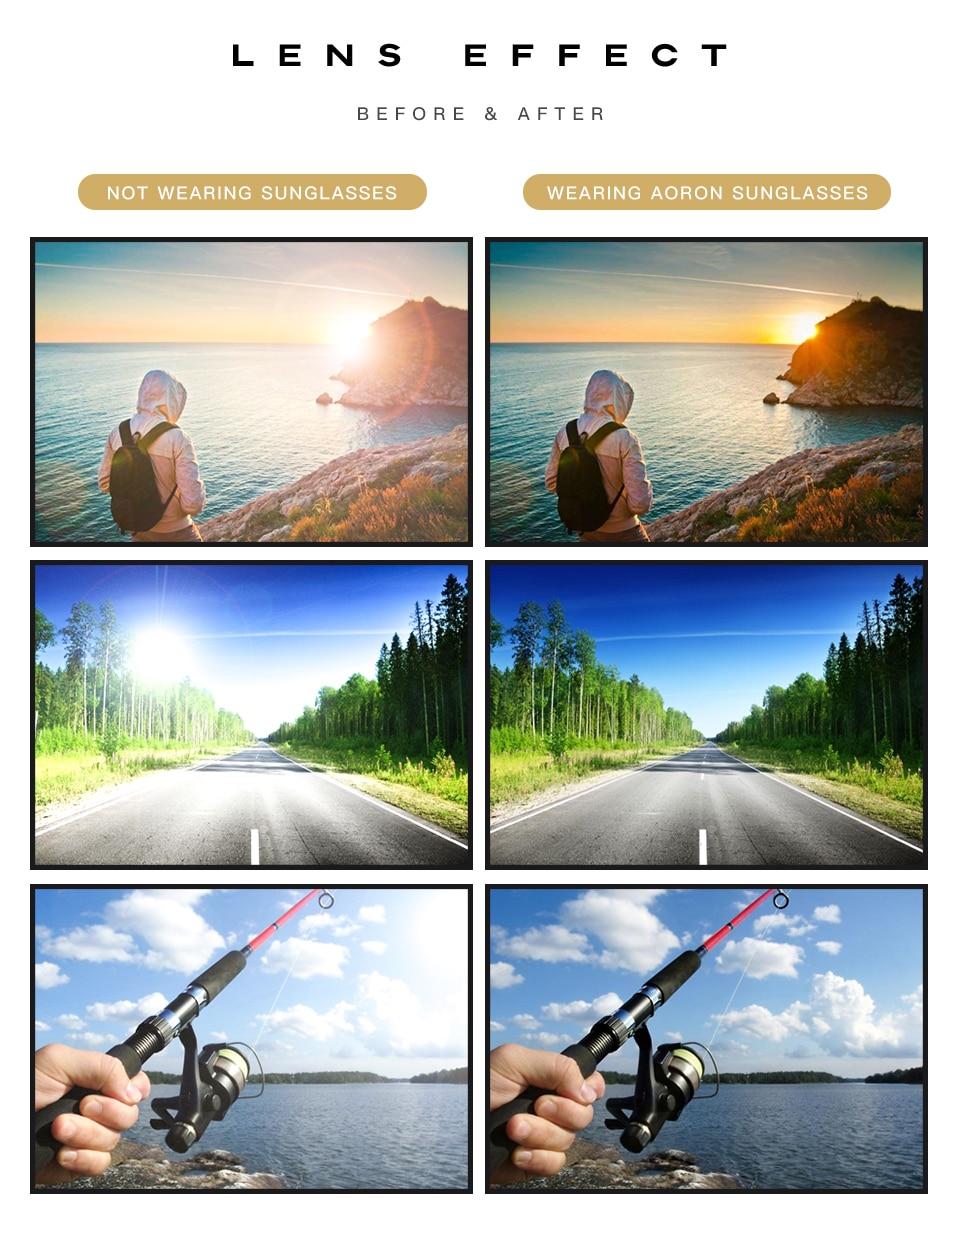 He08a3bc470ad4aeca43fbf83761f6aa0T  ShopWPH.com  1